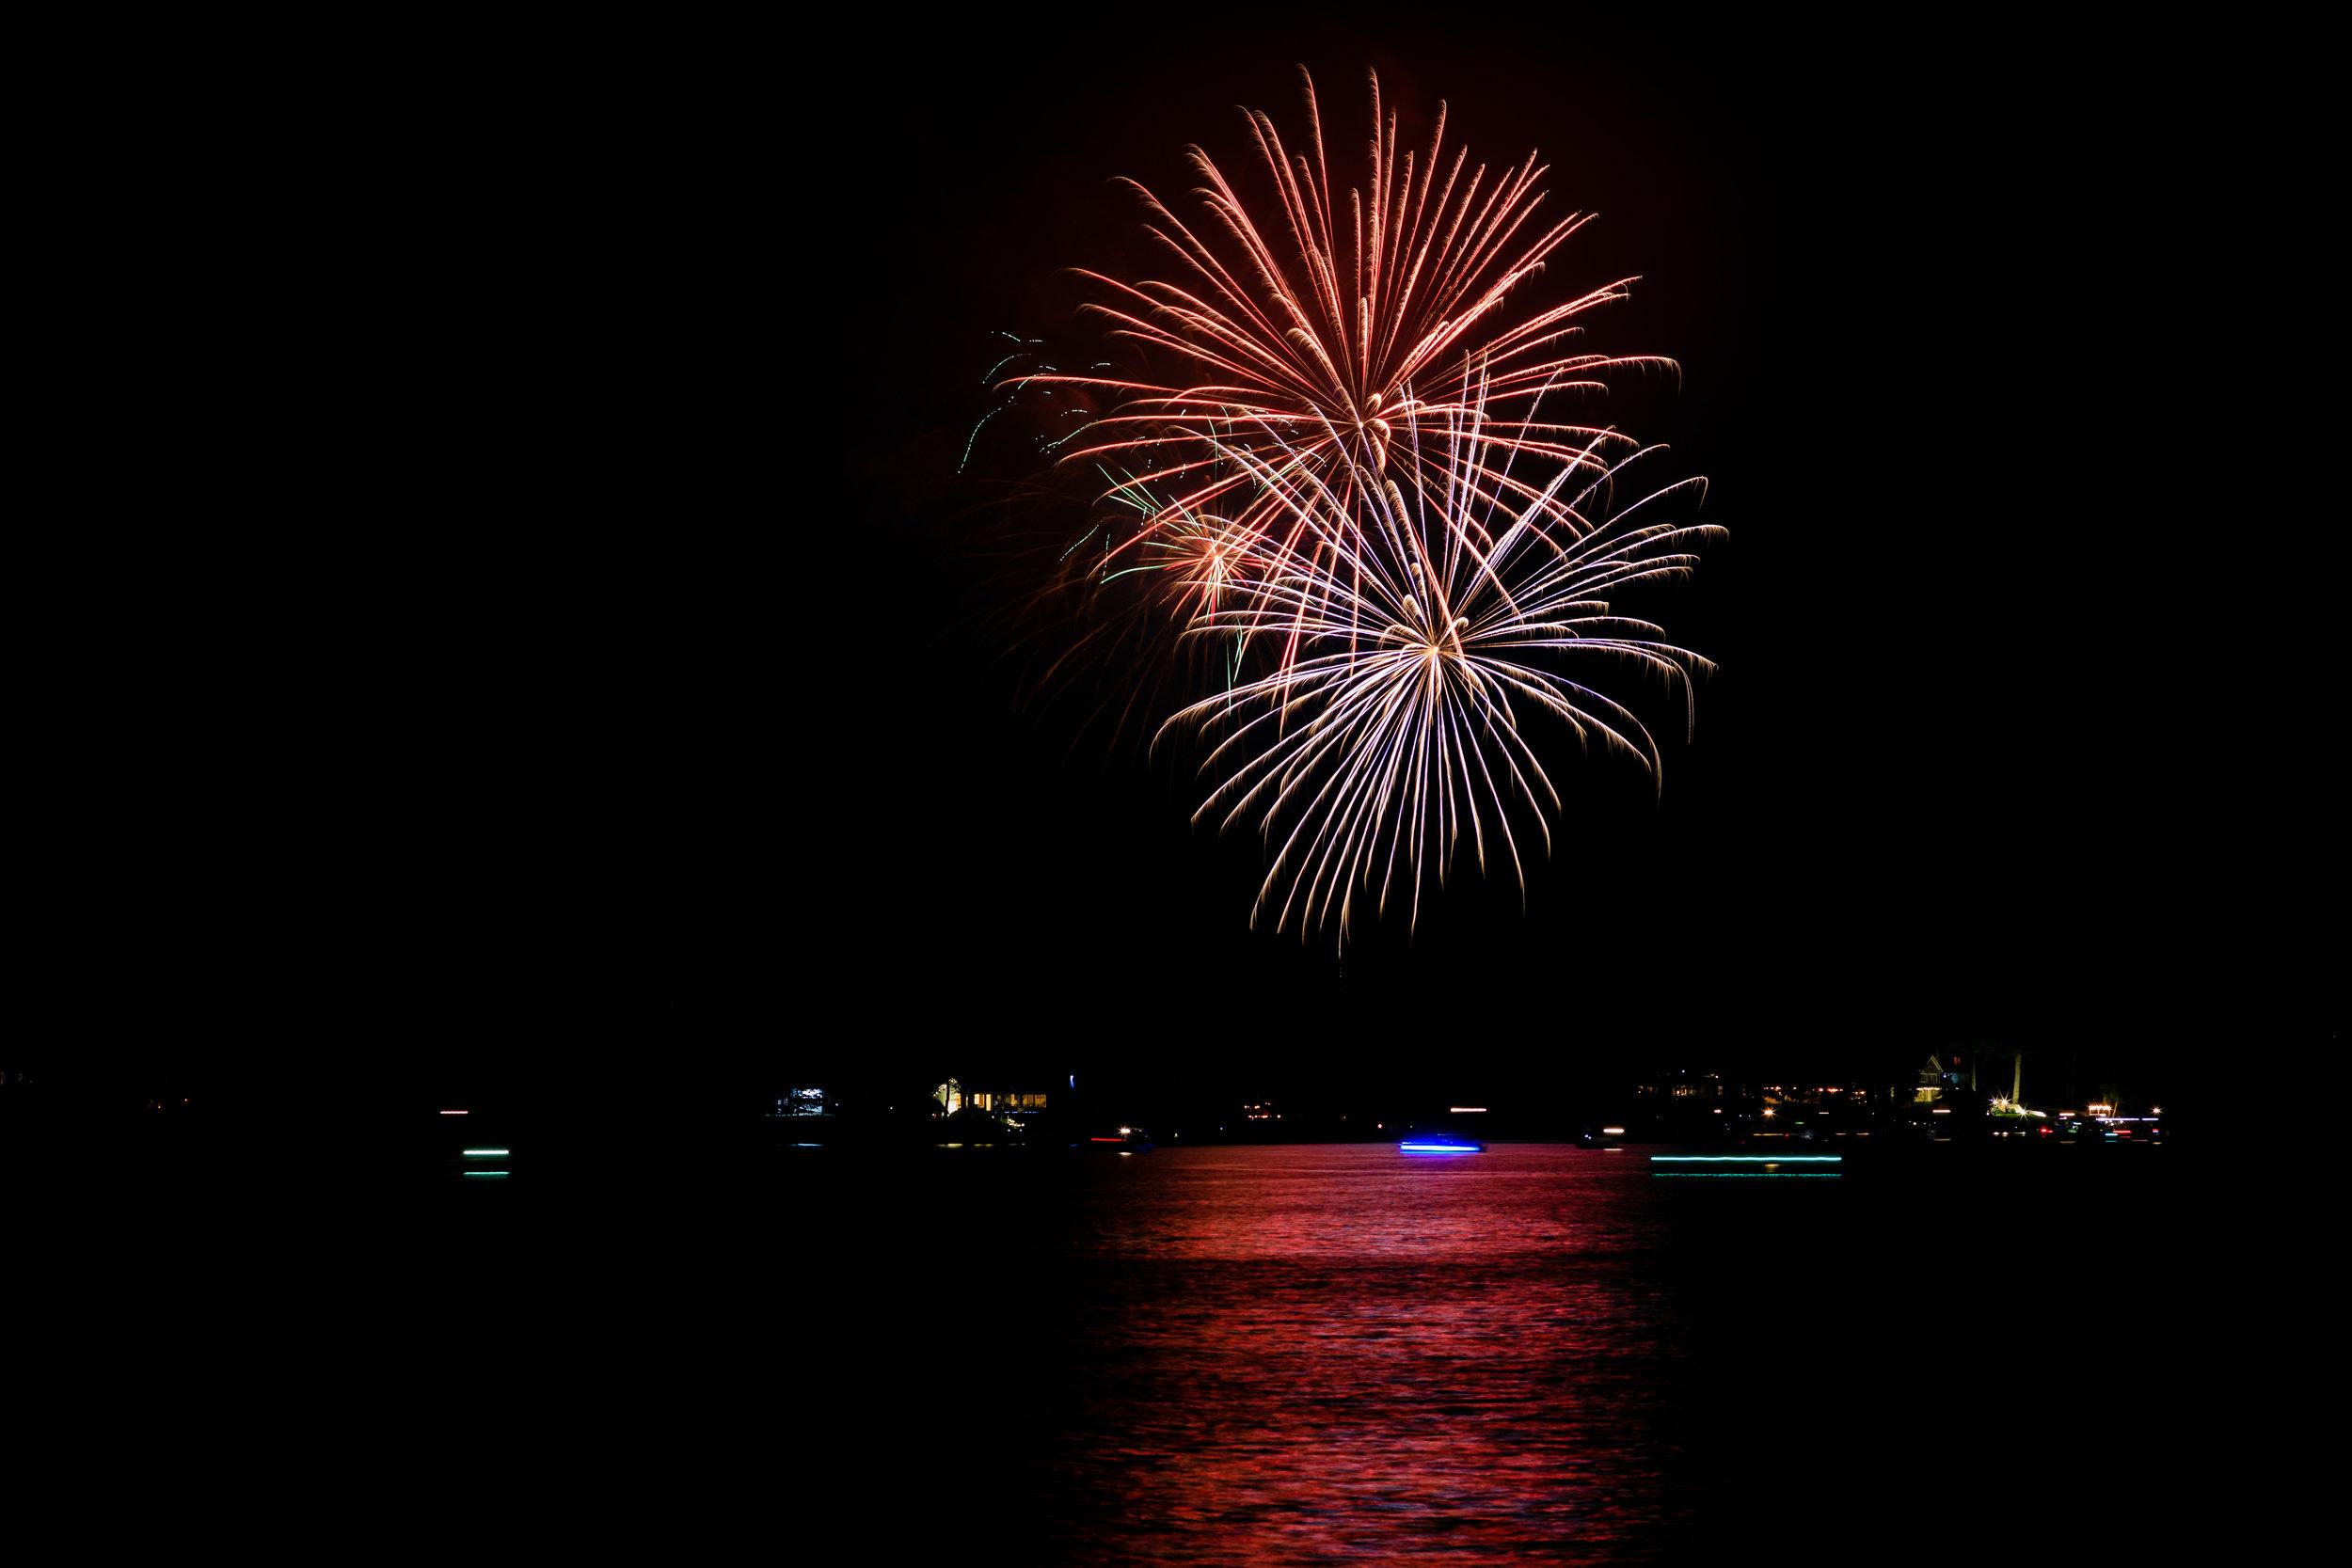 Fireworks-2584.jpg